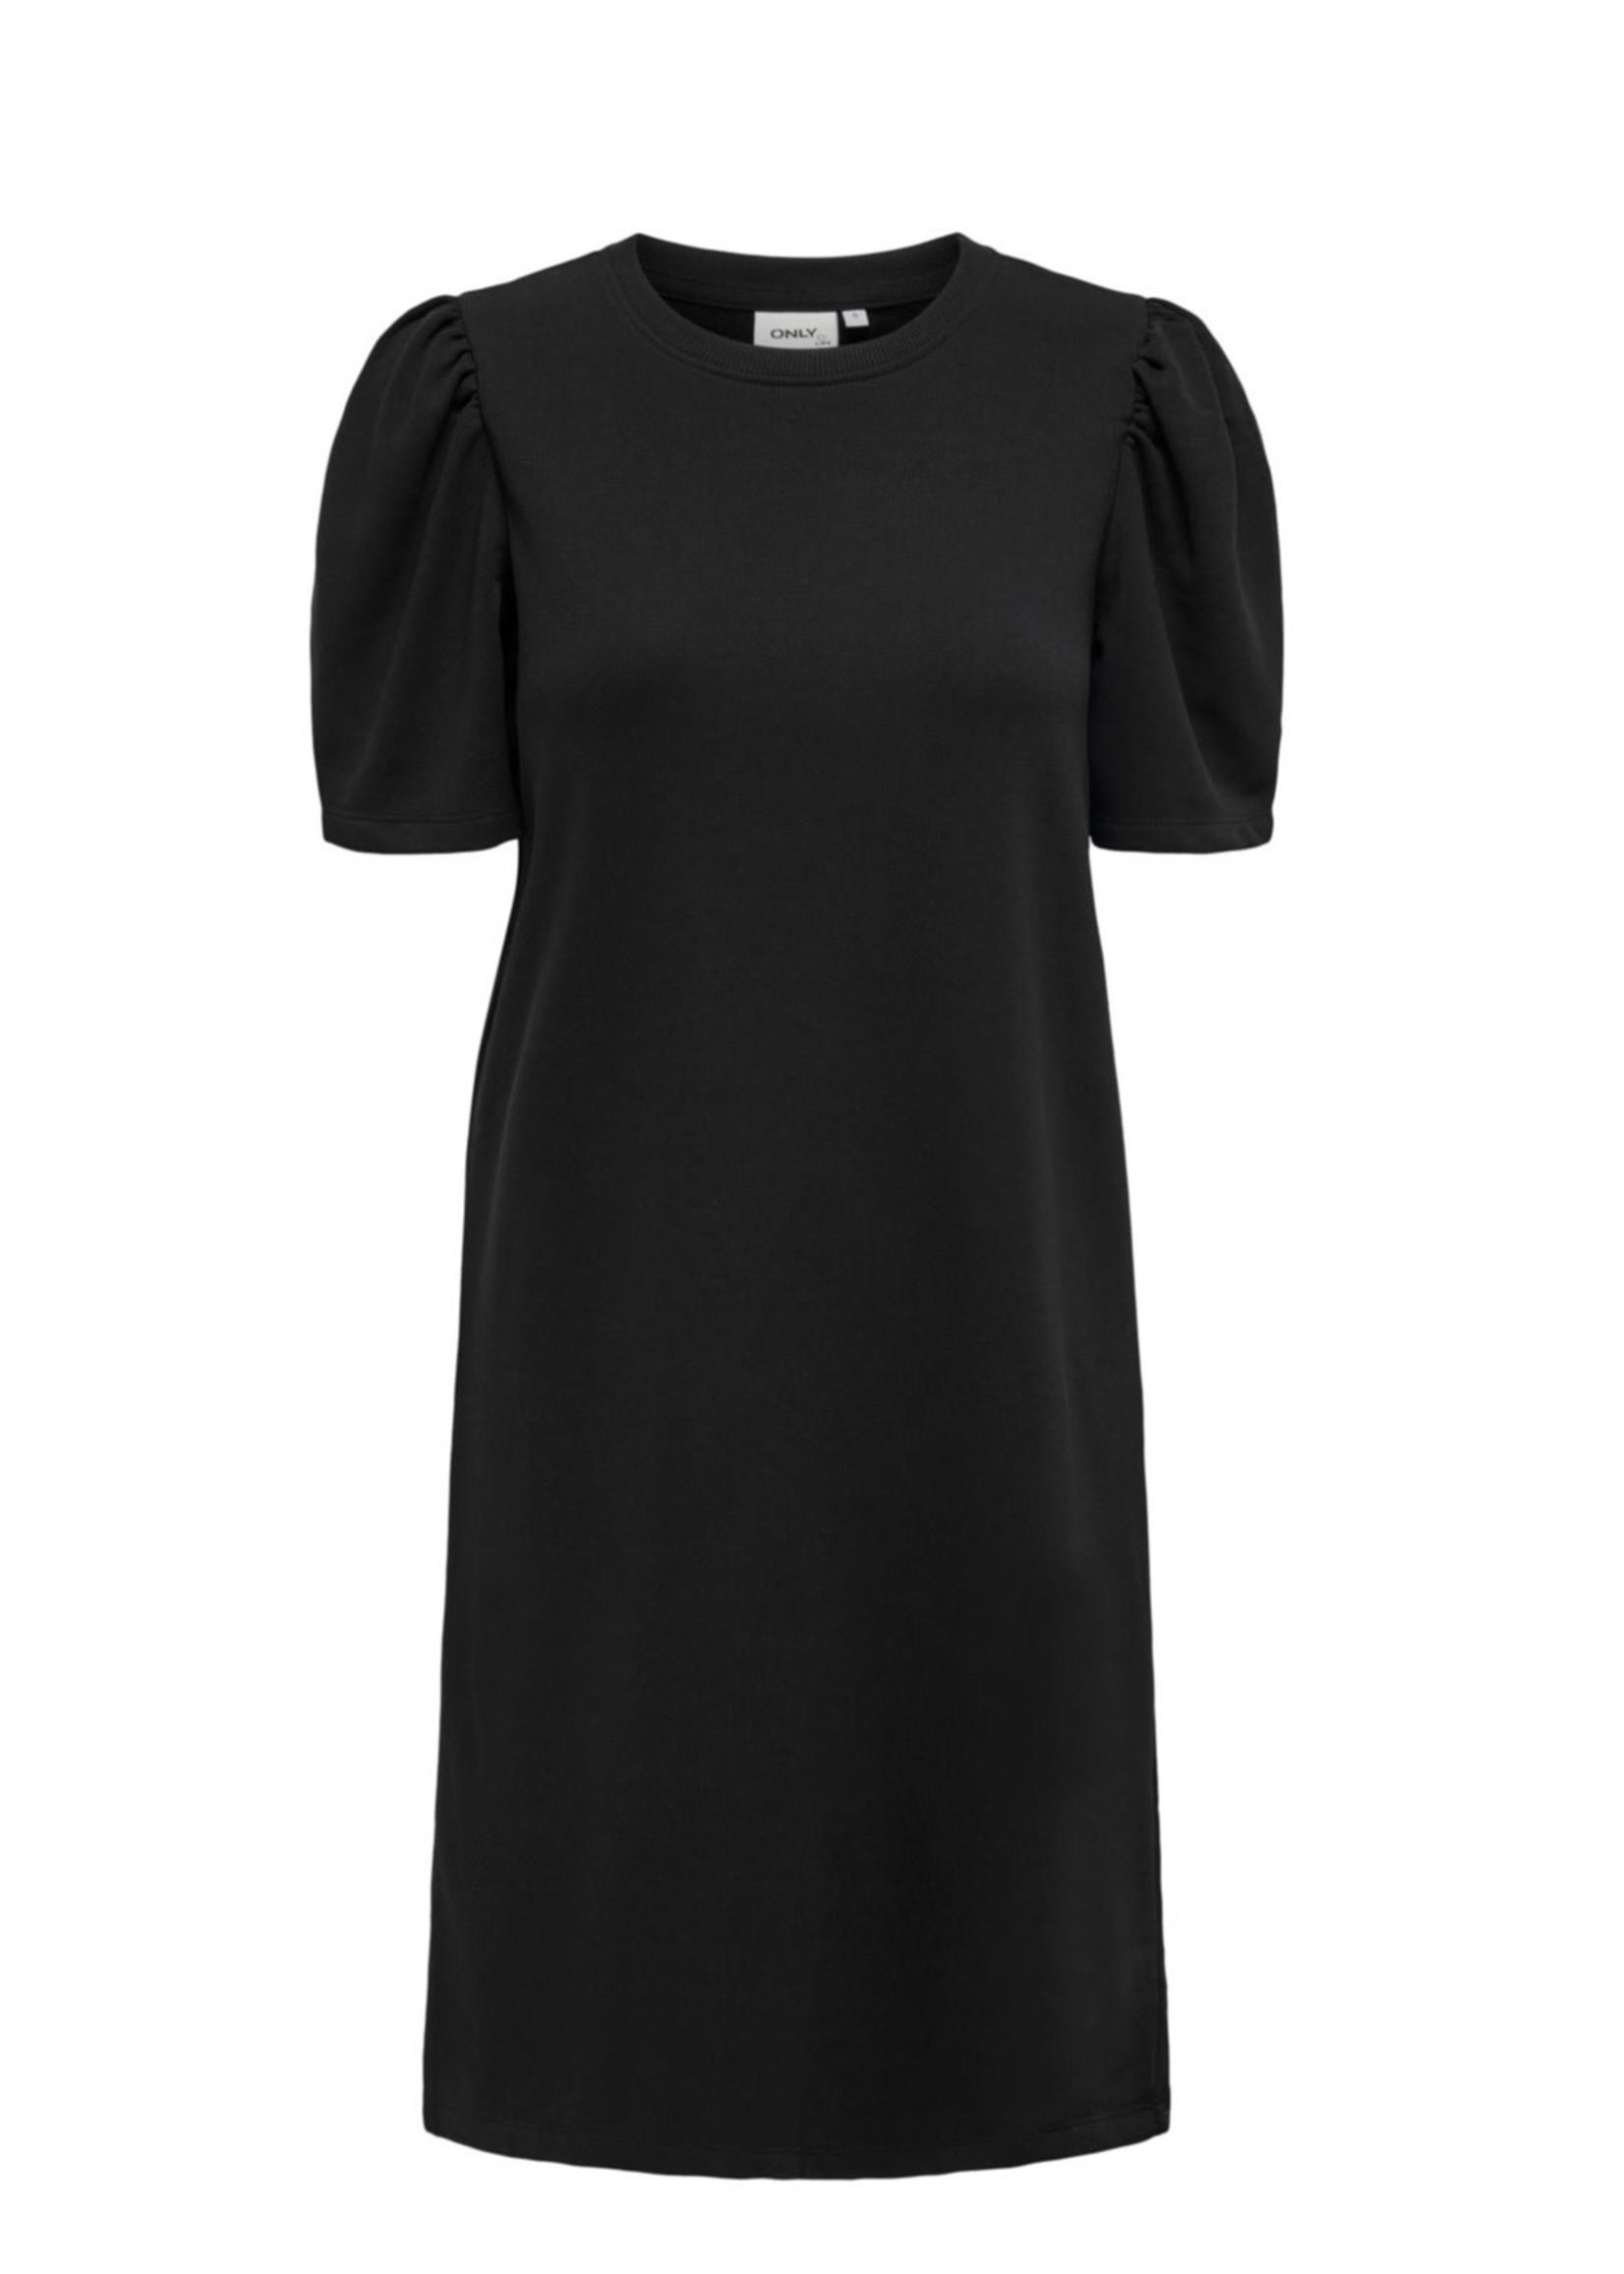 ONLY ONLDIANNA LIFE S/S O-NECK DRESS SWT Black